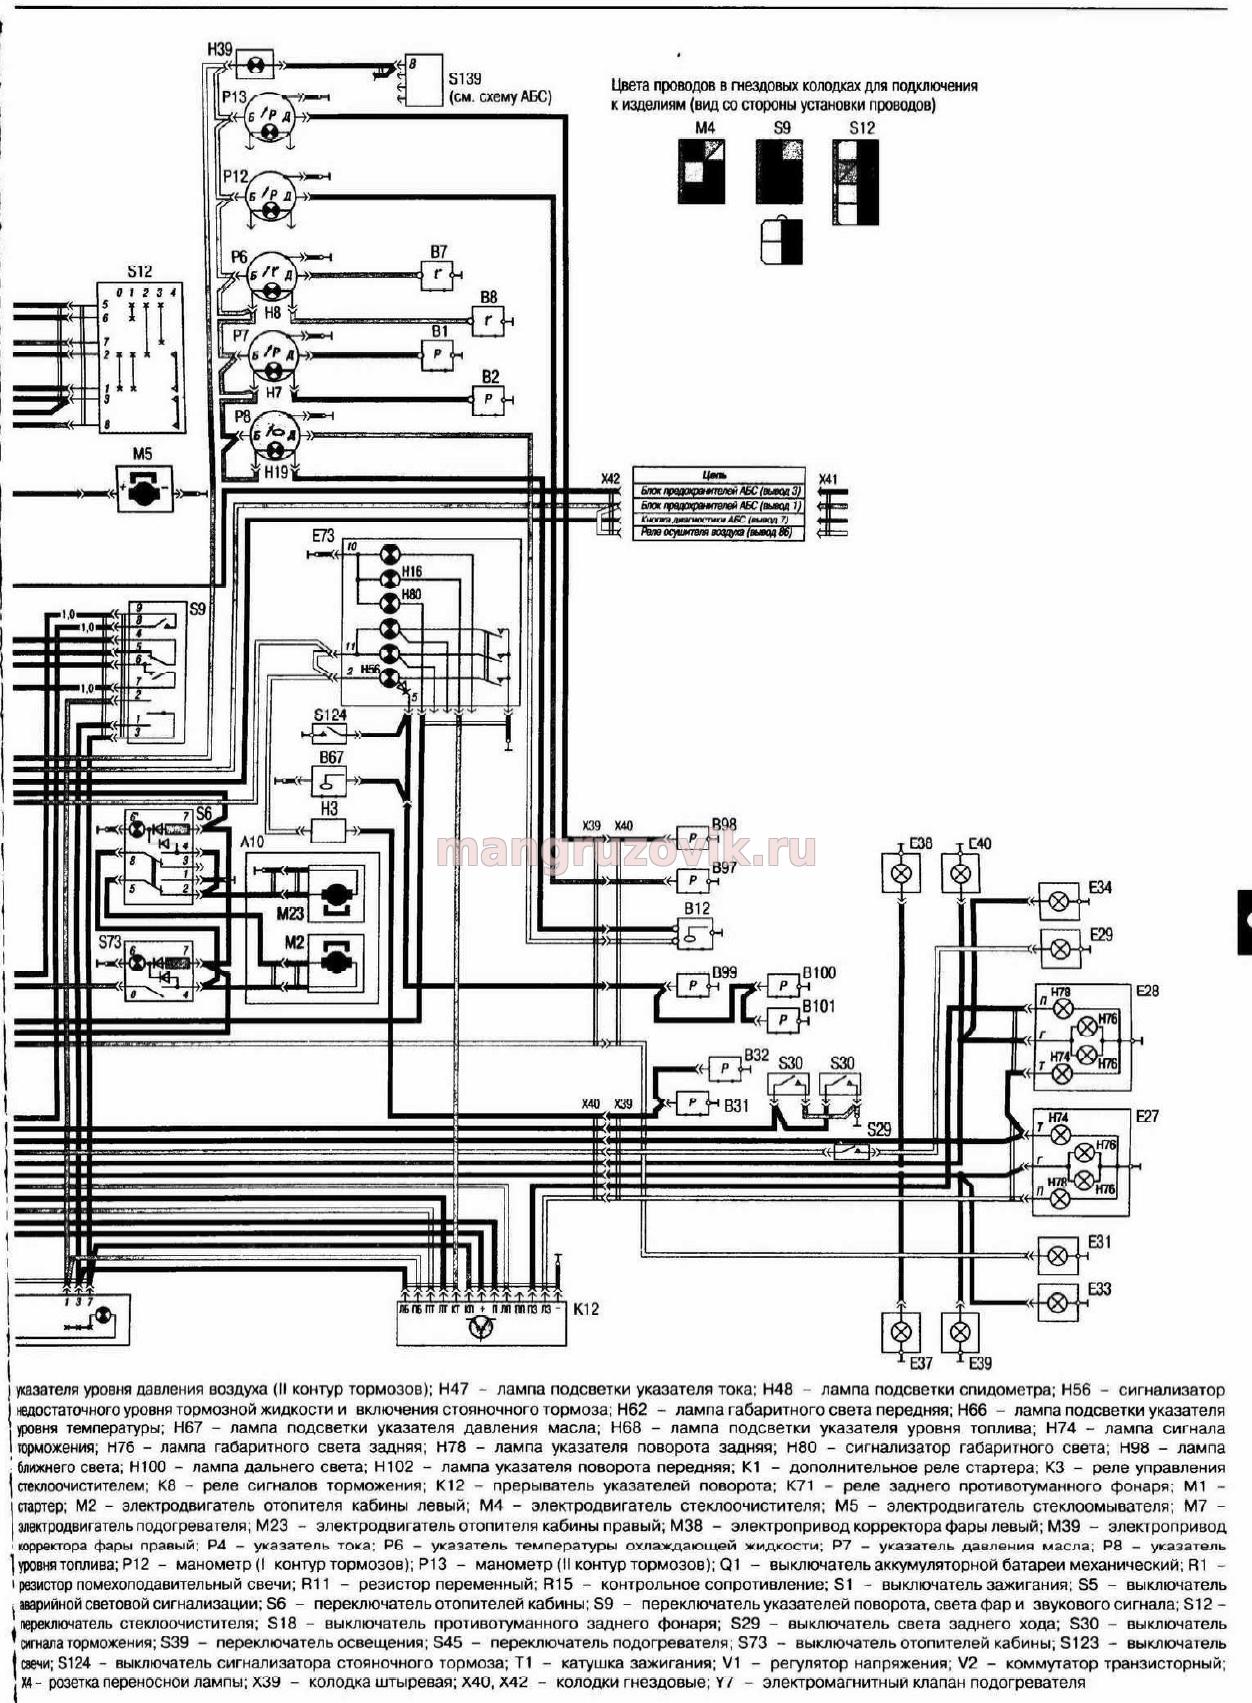 Схема газ 3307 бесплатно фото 978